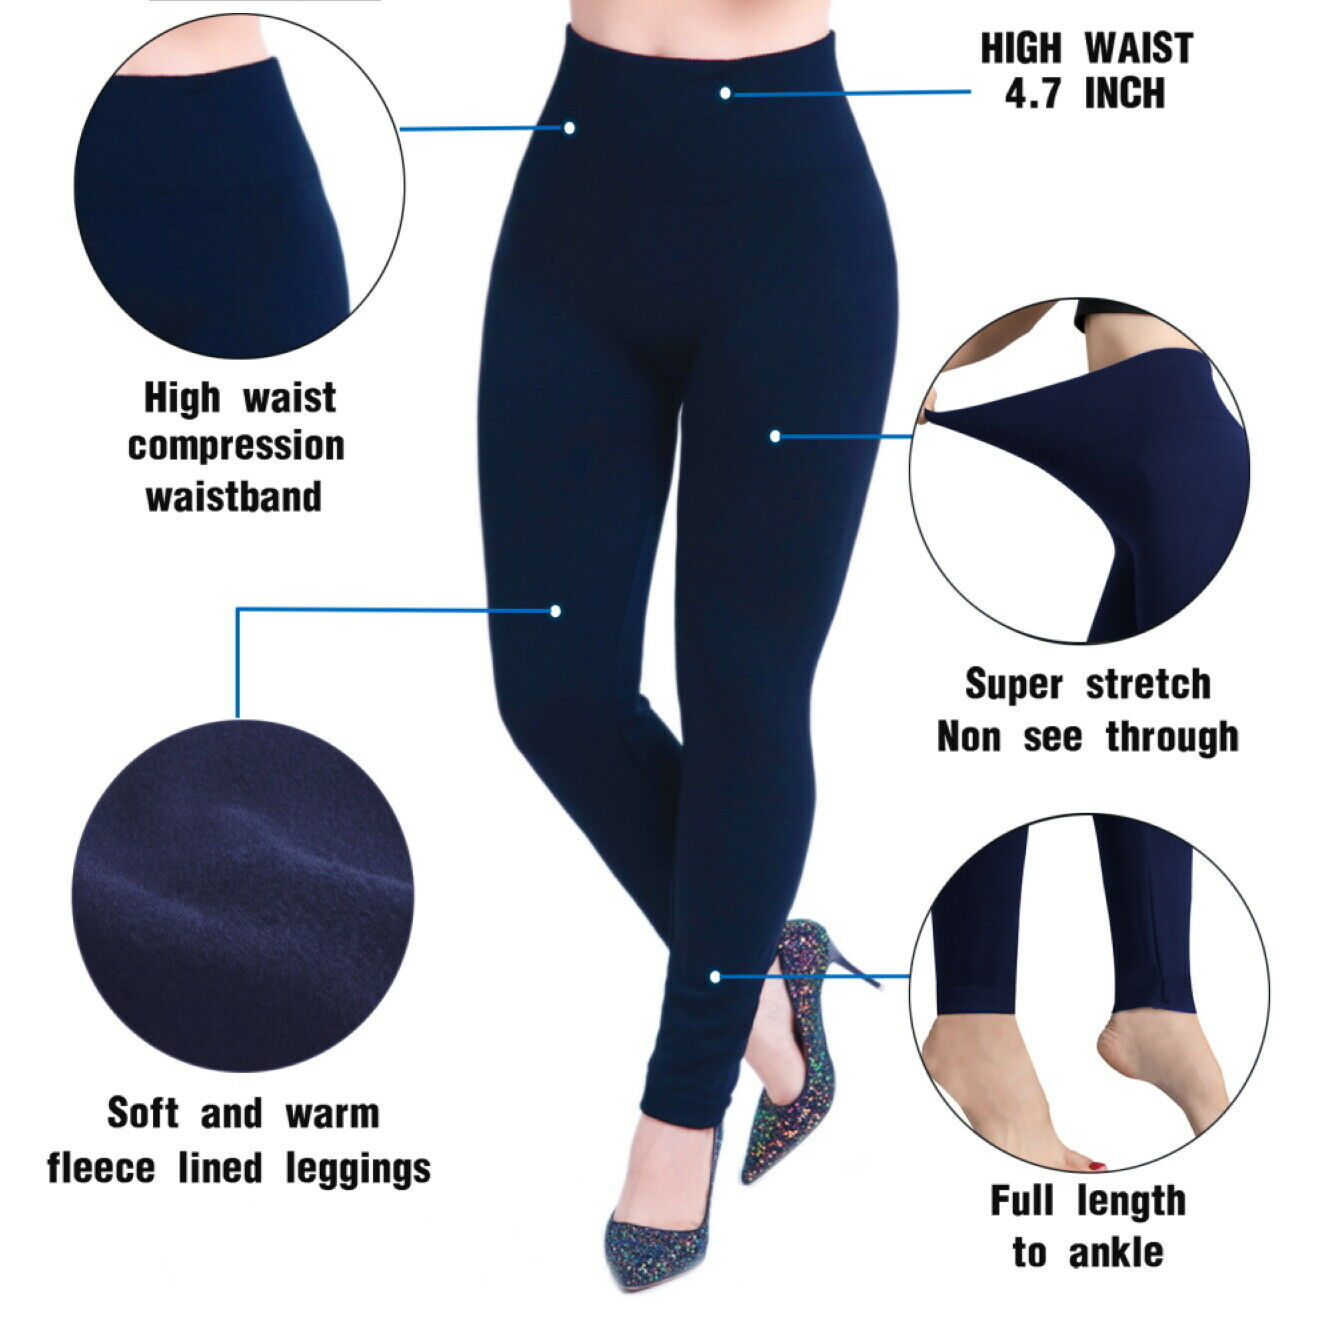 Damen High Waist Shapewear Thermo Leggings, Bauchweg Miederhose Sport Yoga Hose